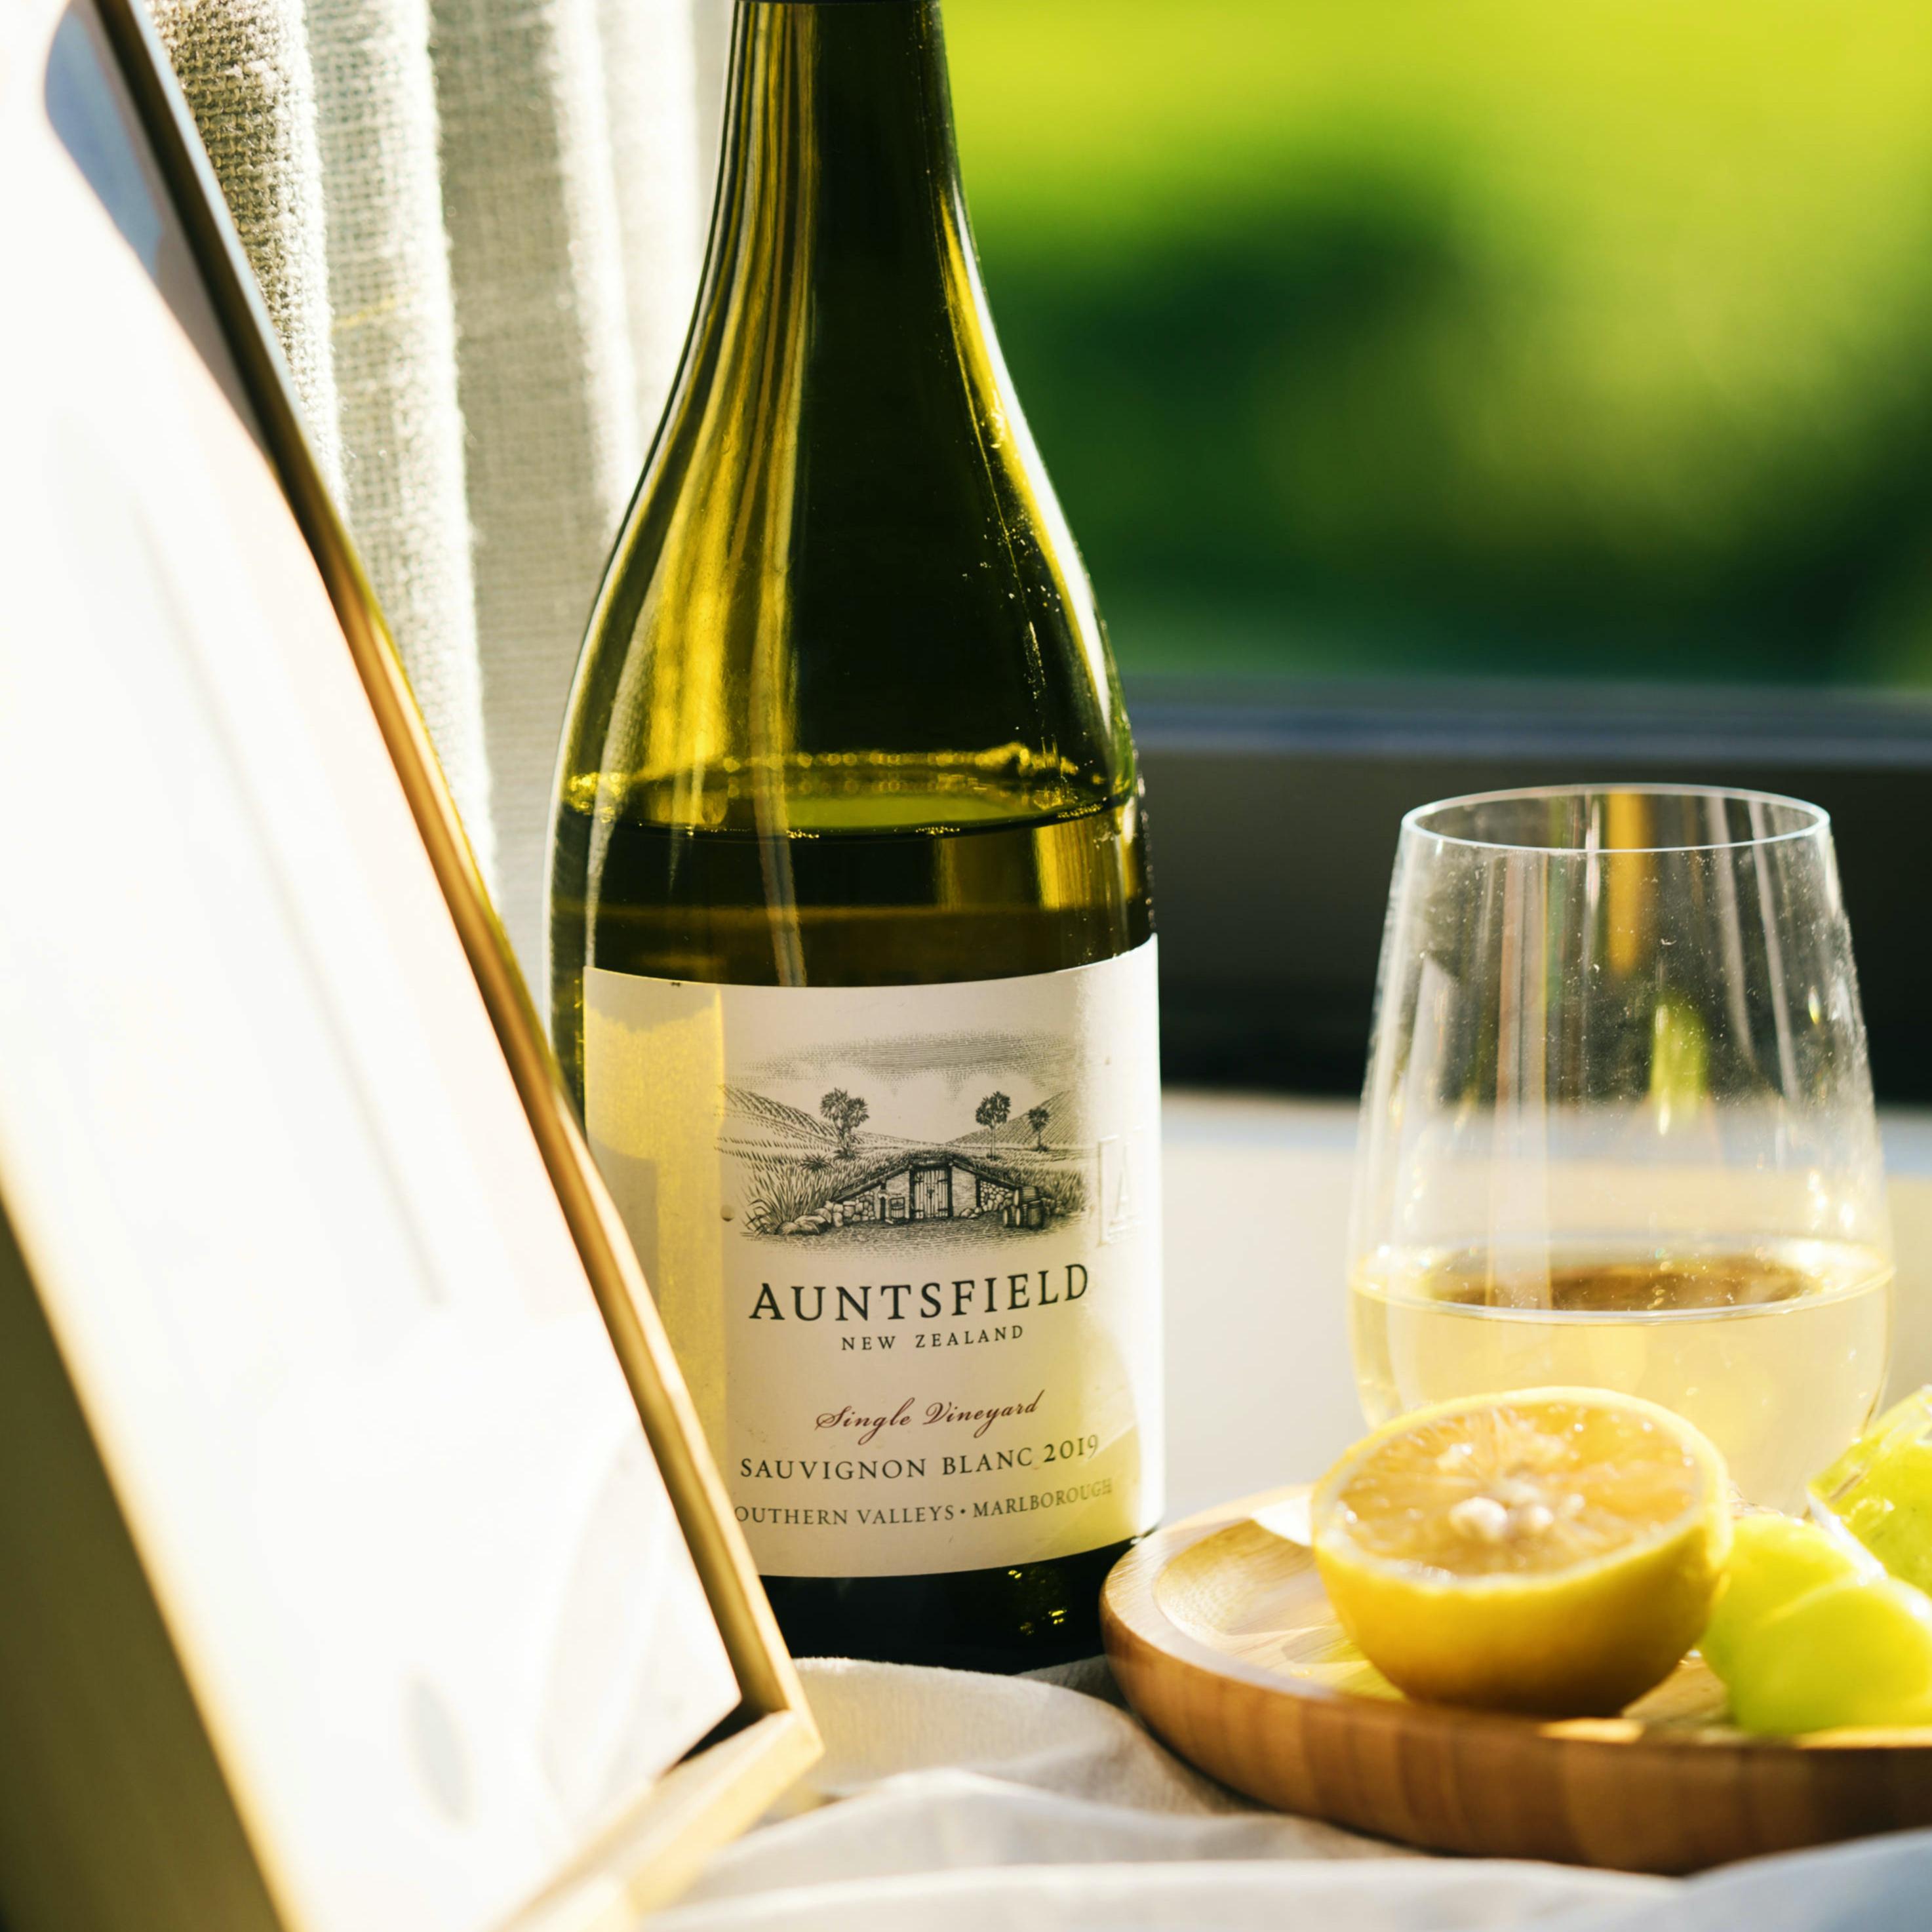 Auntsfield 原瓶进口新西兰马尔堡长相思干白葡萄酒单一园 名庄